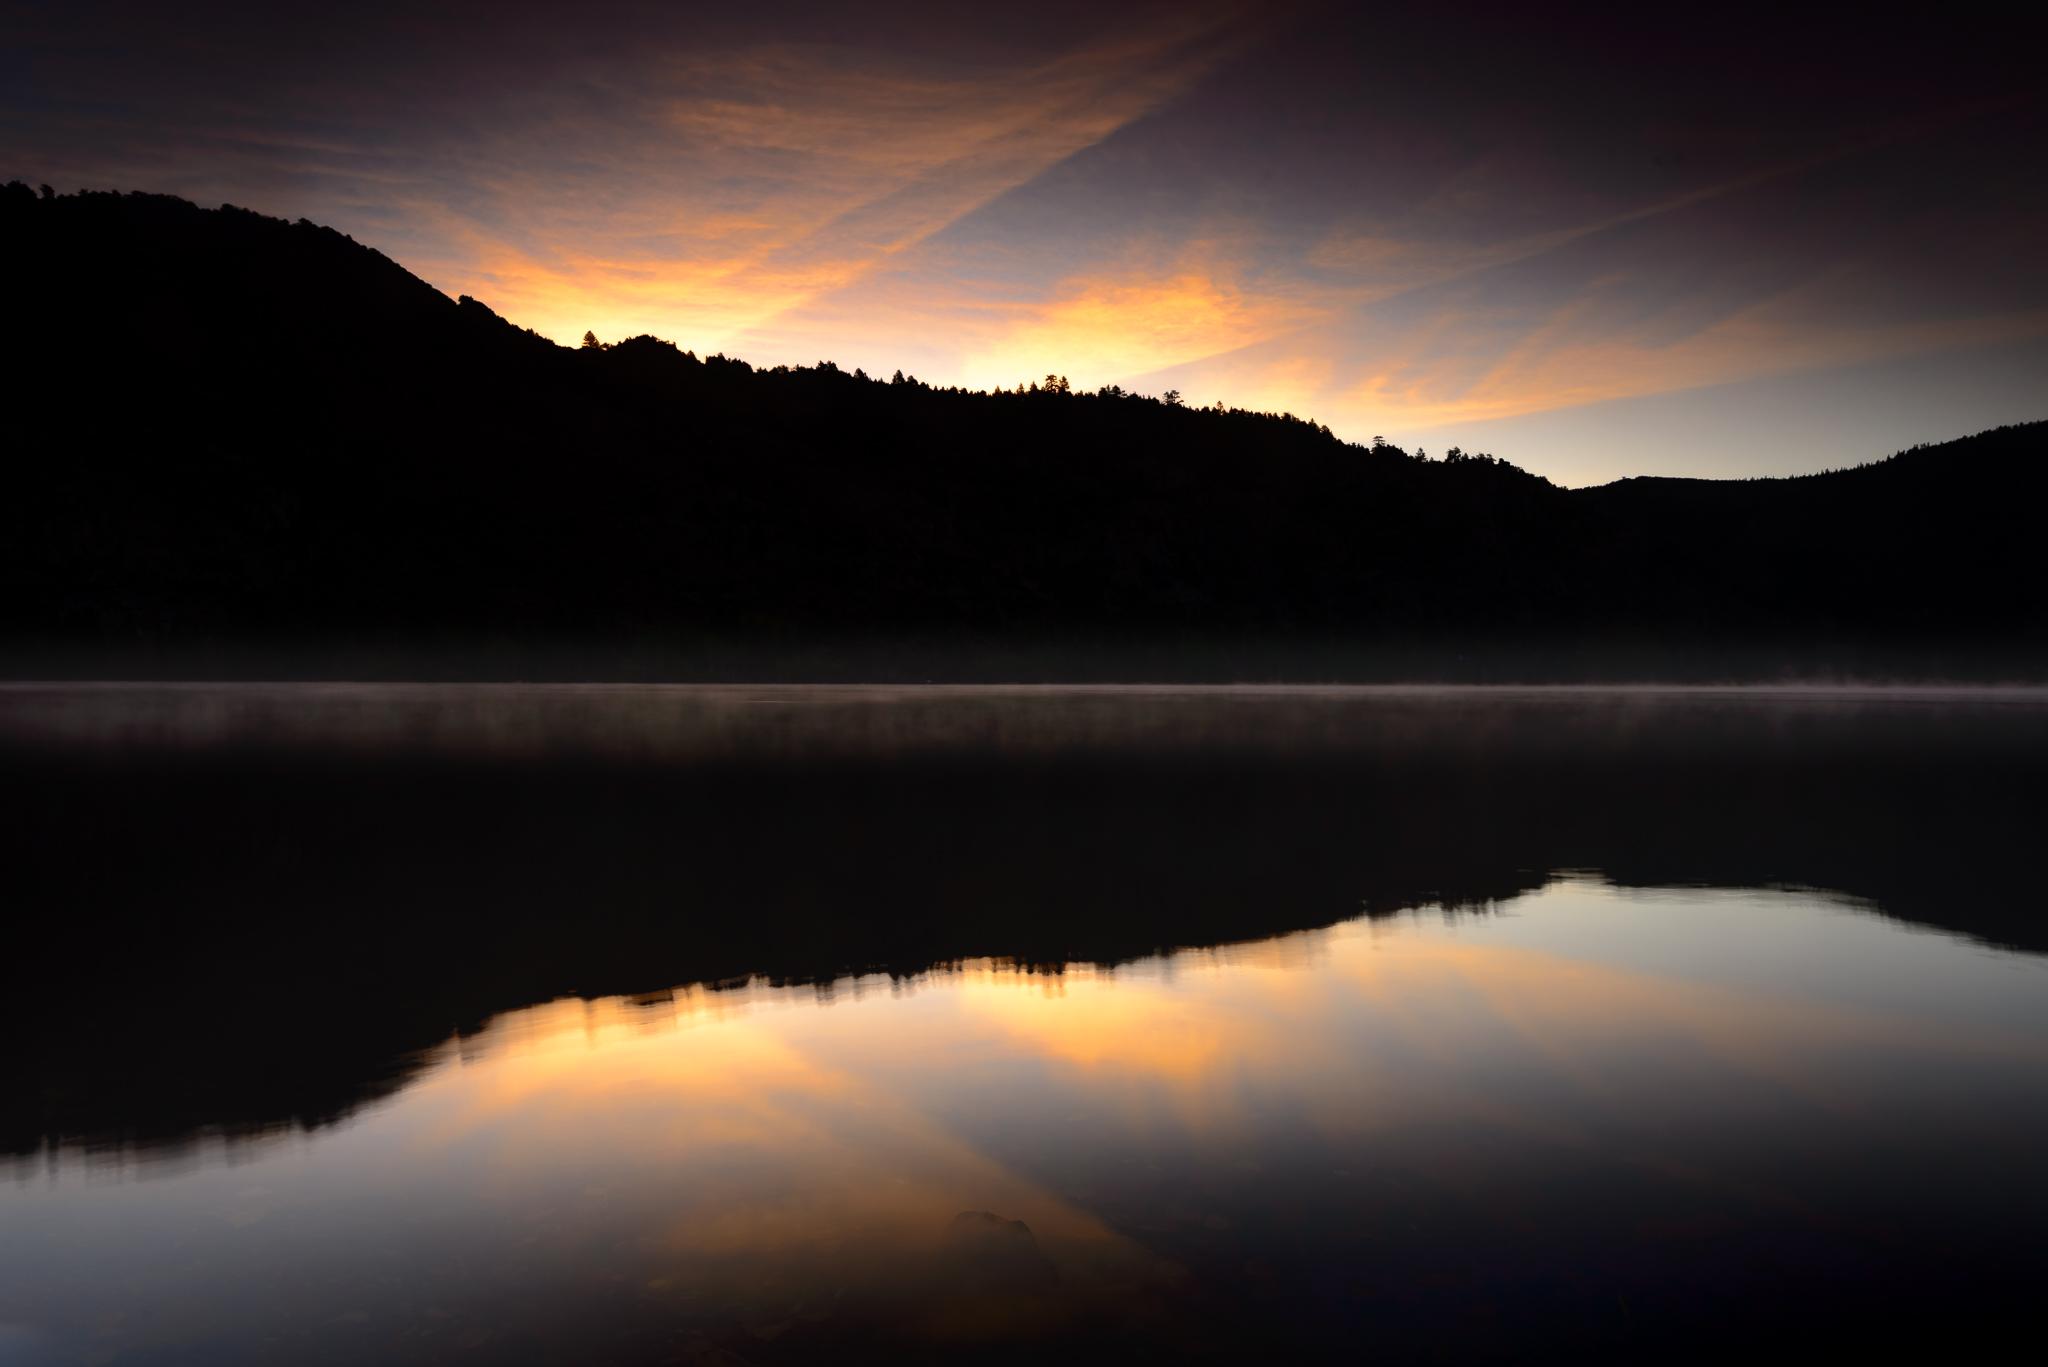 silver_lake_sierras_sunrise